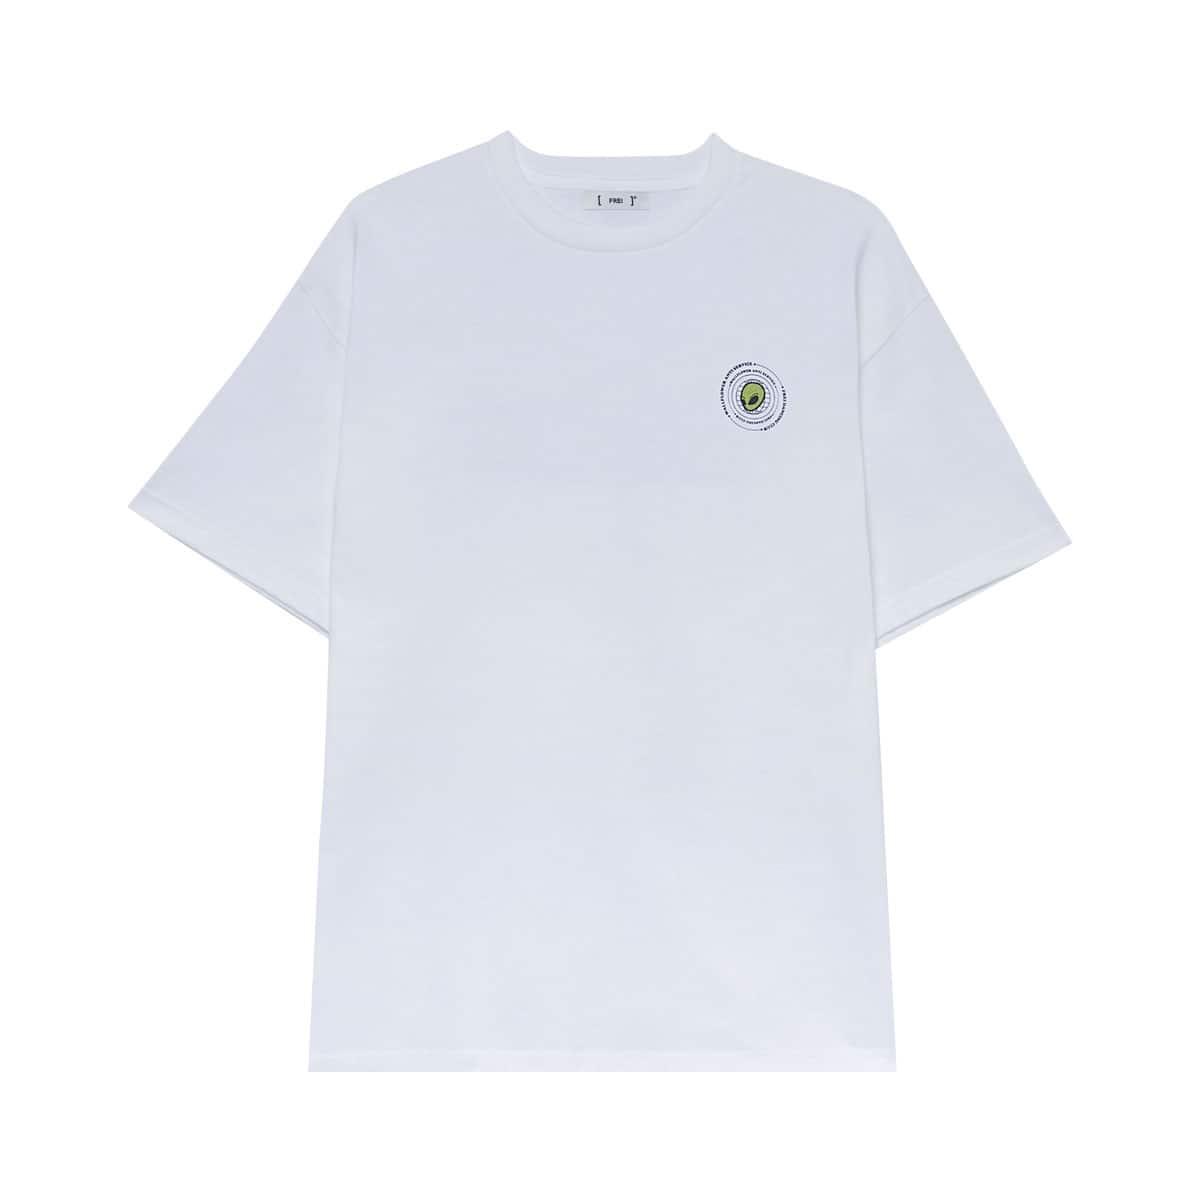 FREI X ATMOS C LOGO T-SHIRT White 20SU-I_photo_large